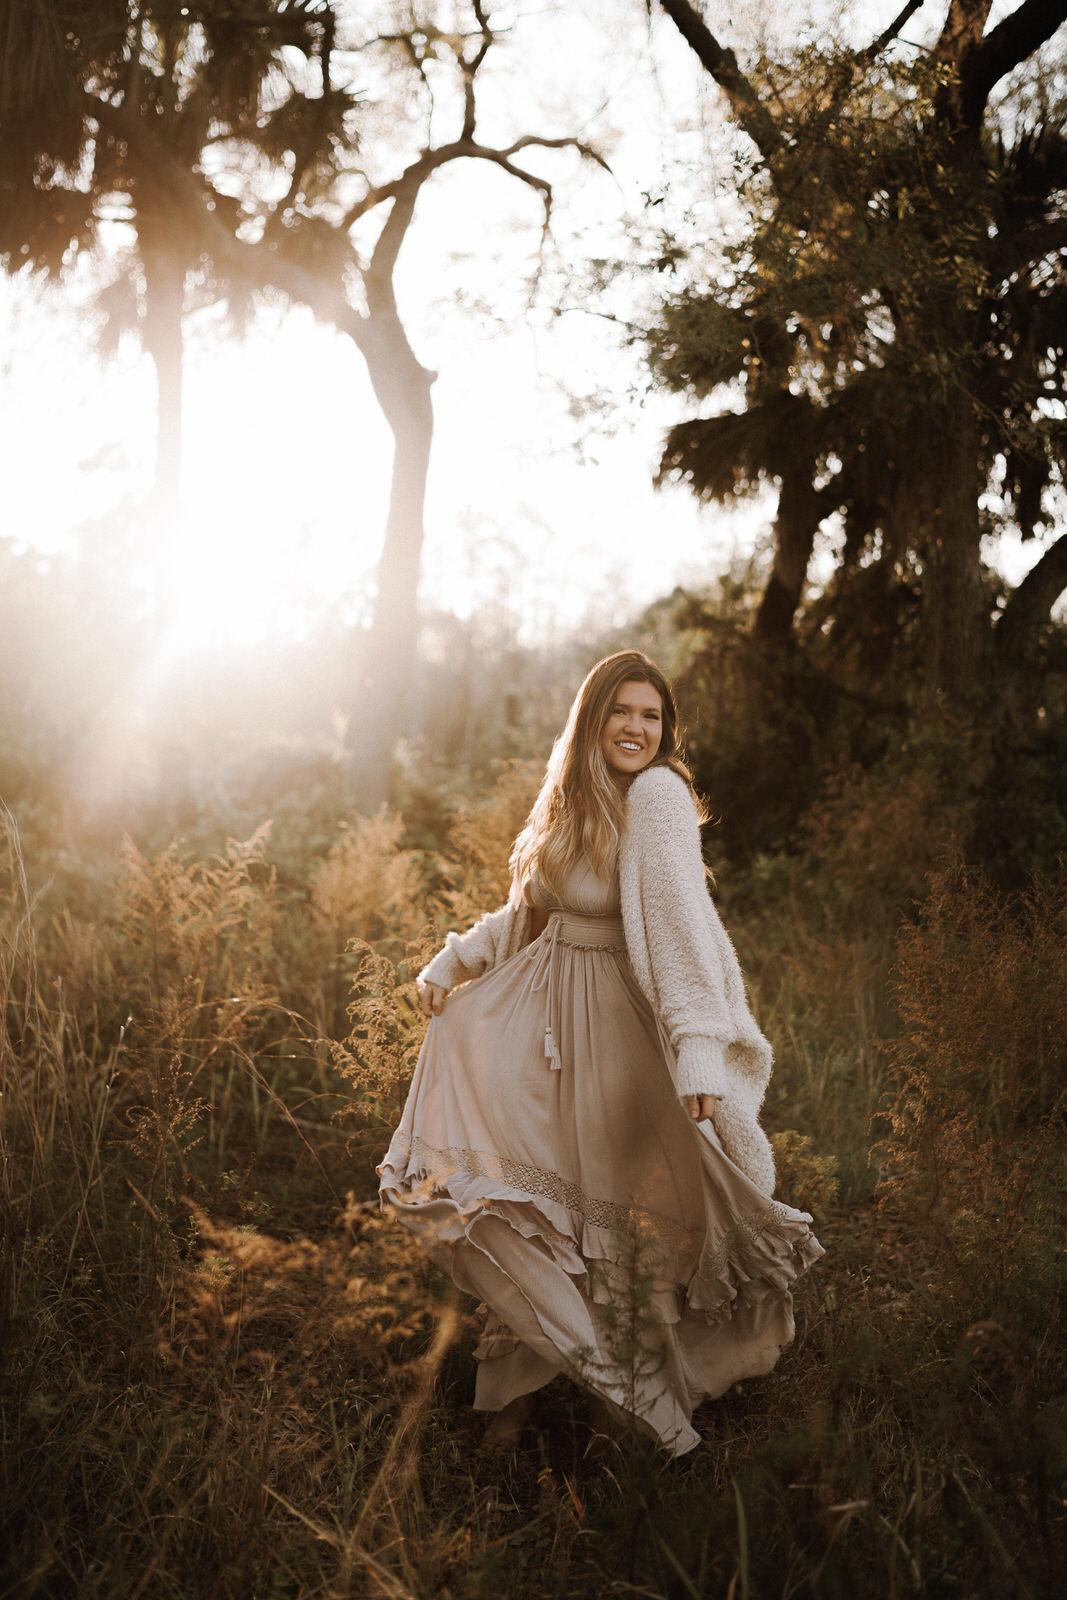 Fort Myers Senior Photos- Michelle Gonzalez Photography- Kristen Harder-142.JPG